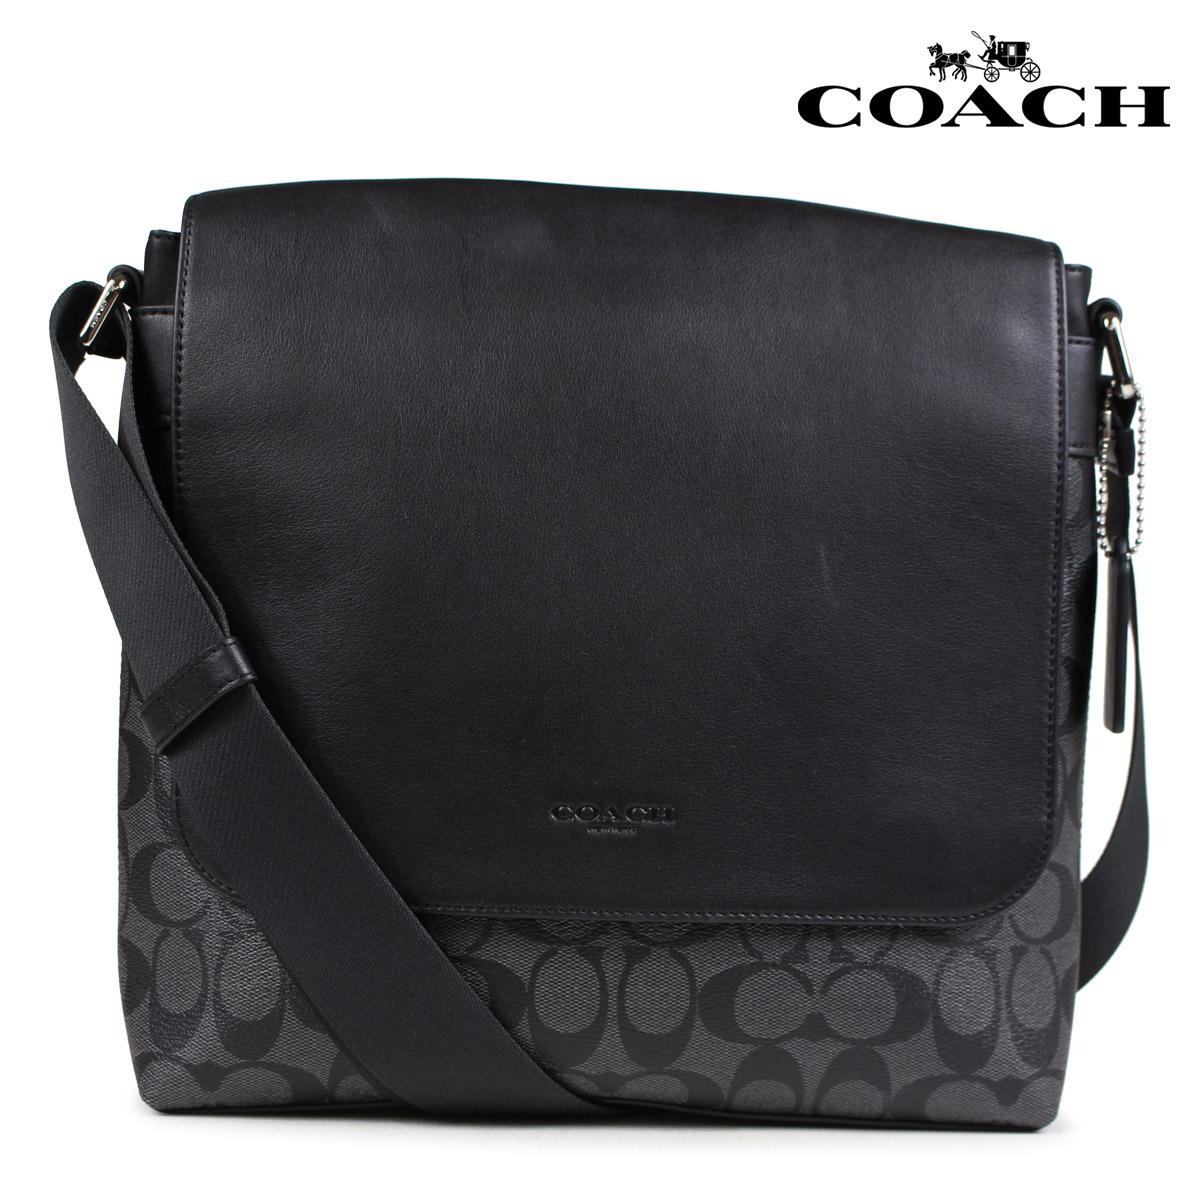 cc4181afd420 COACH CHARLES SMALL MESSENGER coach bag shoulder bag men messenger bag  F28575 gray  9 14 Shinnyu load   189